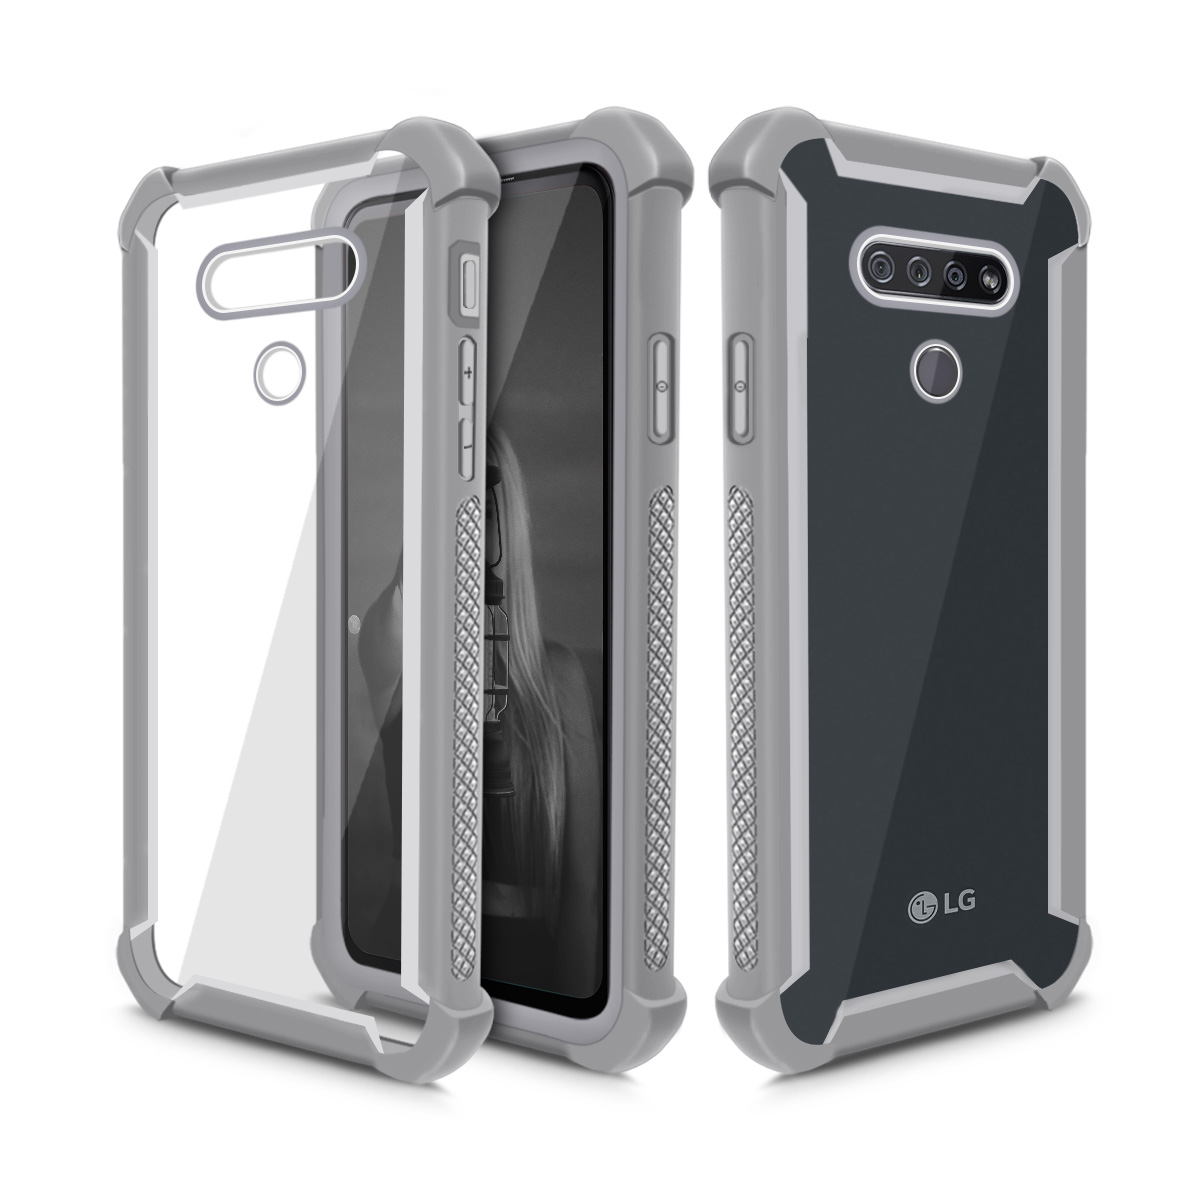 LG-K51-2PCHD-LNCLR-GY